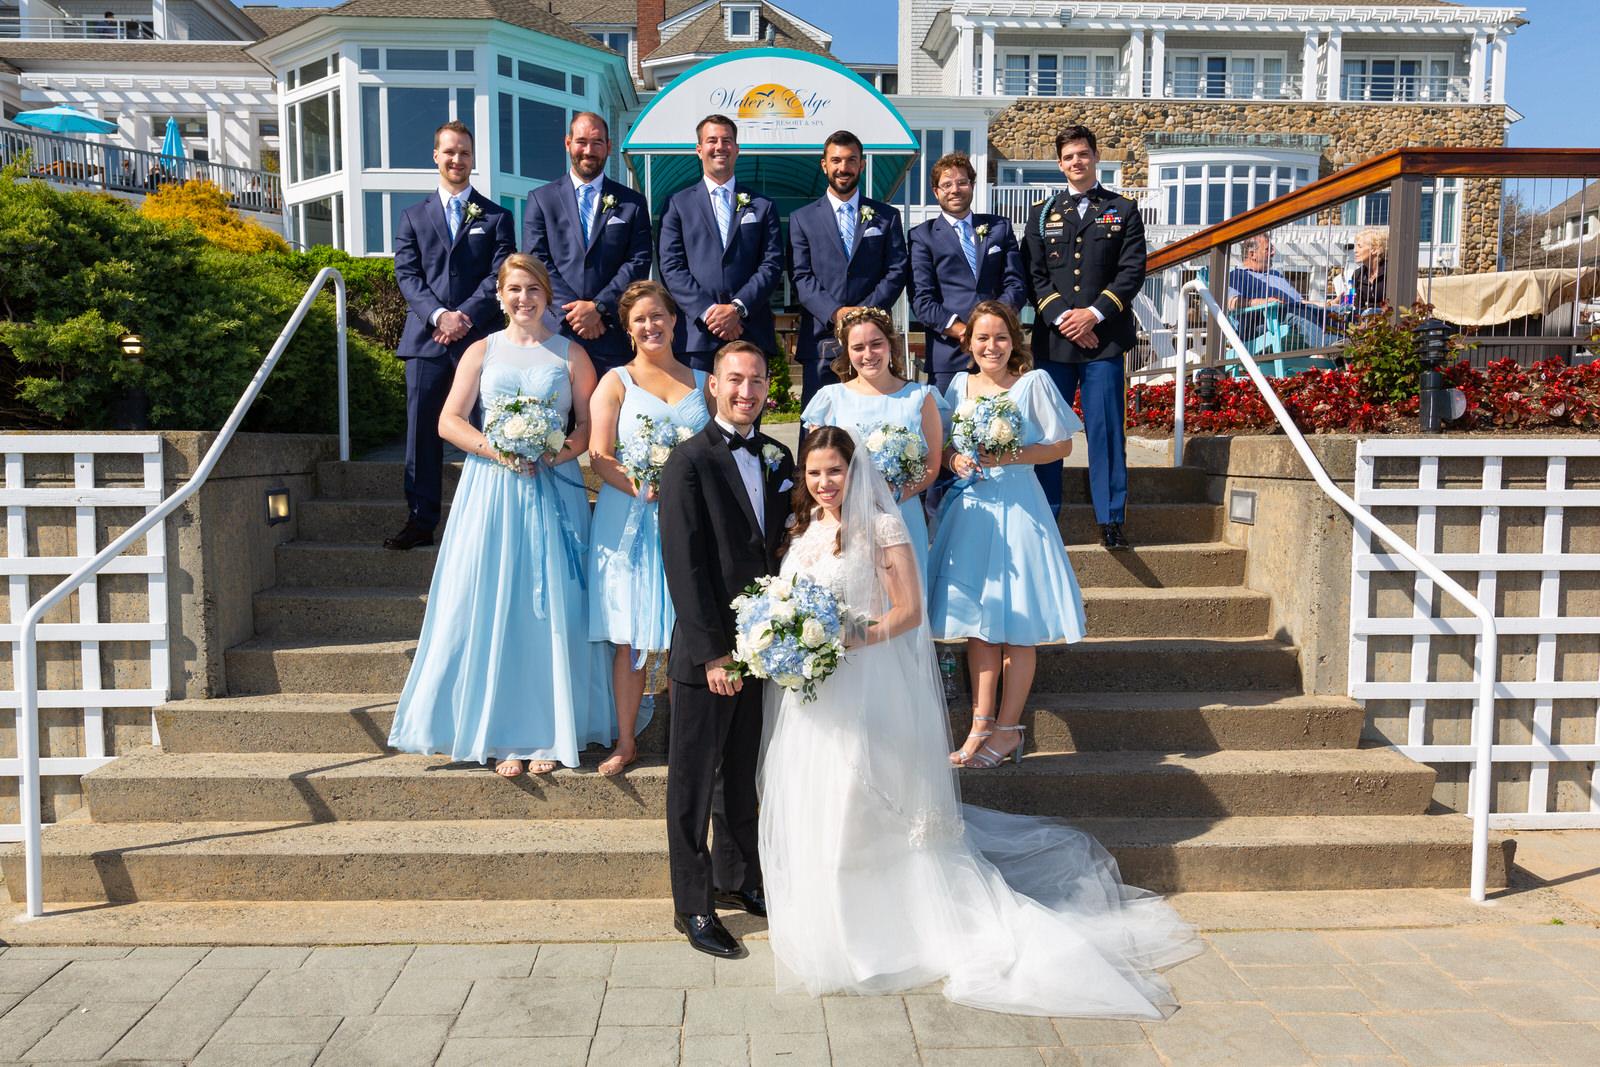 Water's Edge Wedding Photography - CT Photo Group